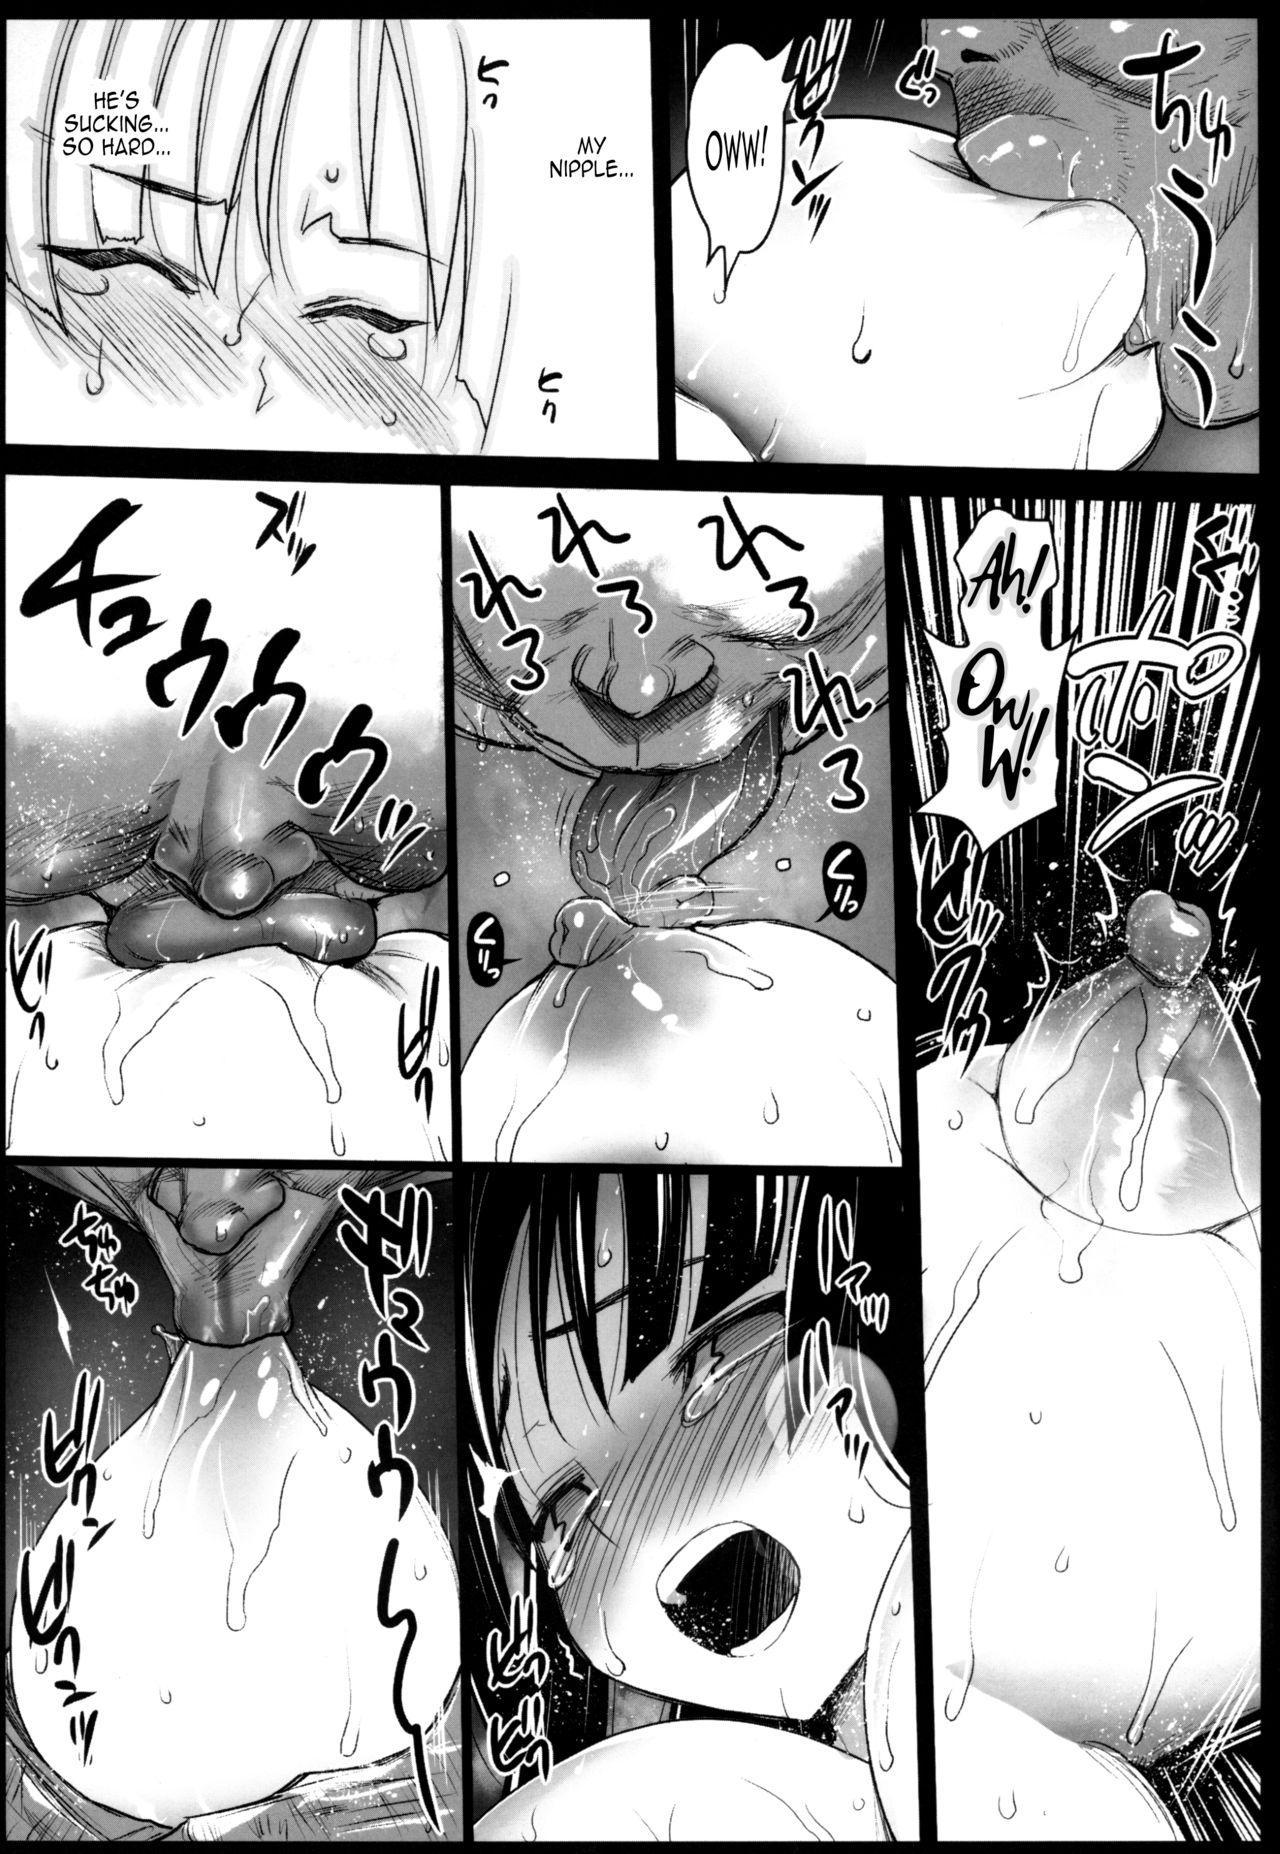 [Eromazun (Ma-Kurou)] Saint Helena Gakuen 2 ~ Terrorist ni Senkyosareta Jogakuen de Rape Matsuri!~   Saint Helena Academy 2 ~A School Occupied by Terrorists Becomes a Rape Festival!~ (Various) [English] [B.E.C. Scans] 11